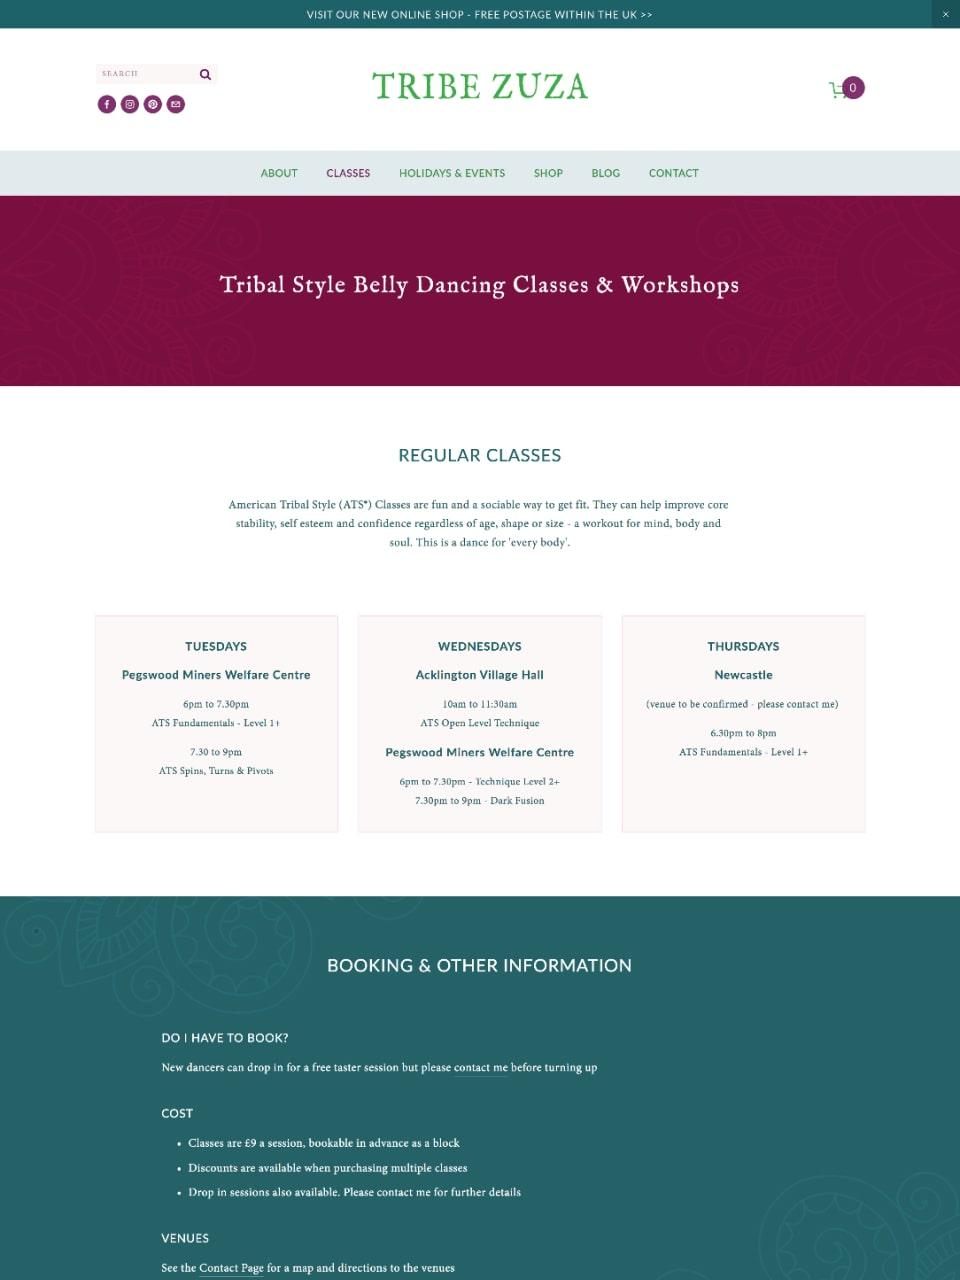 Tribe Zuza Website  Workshops & Regular Classes